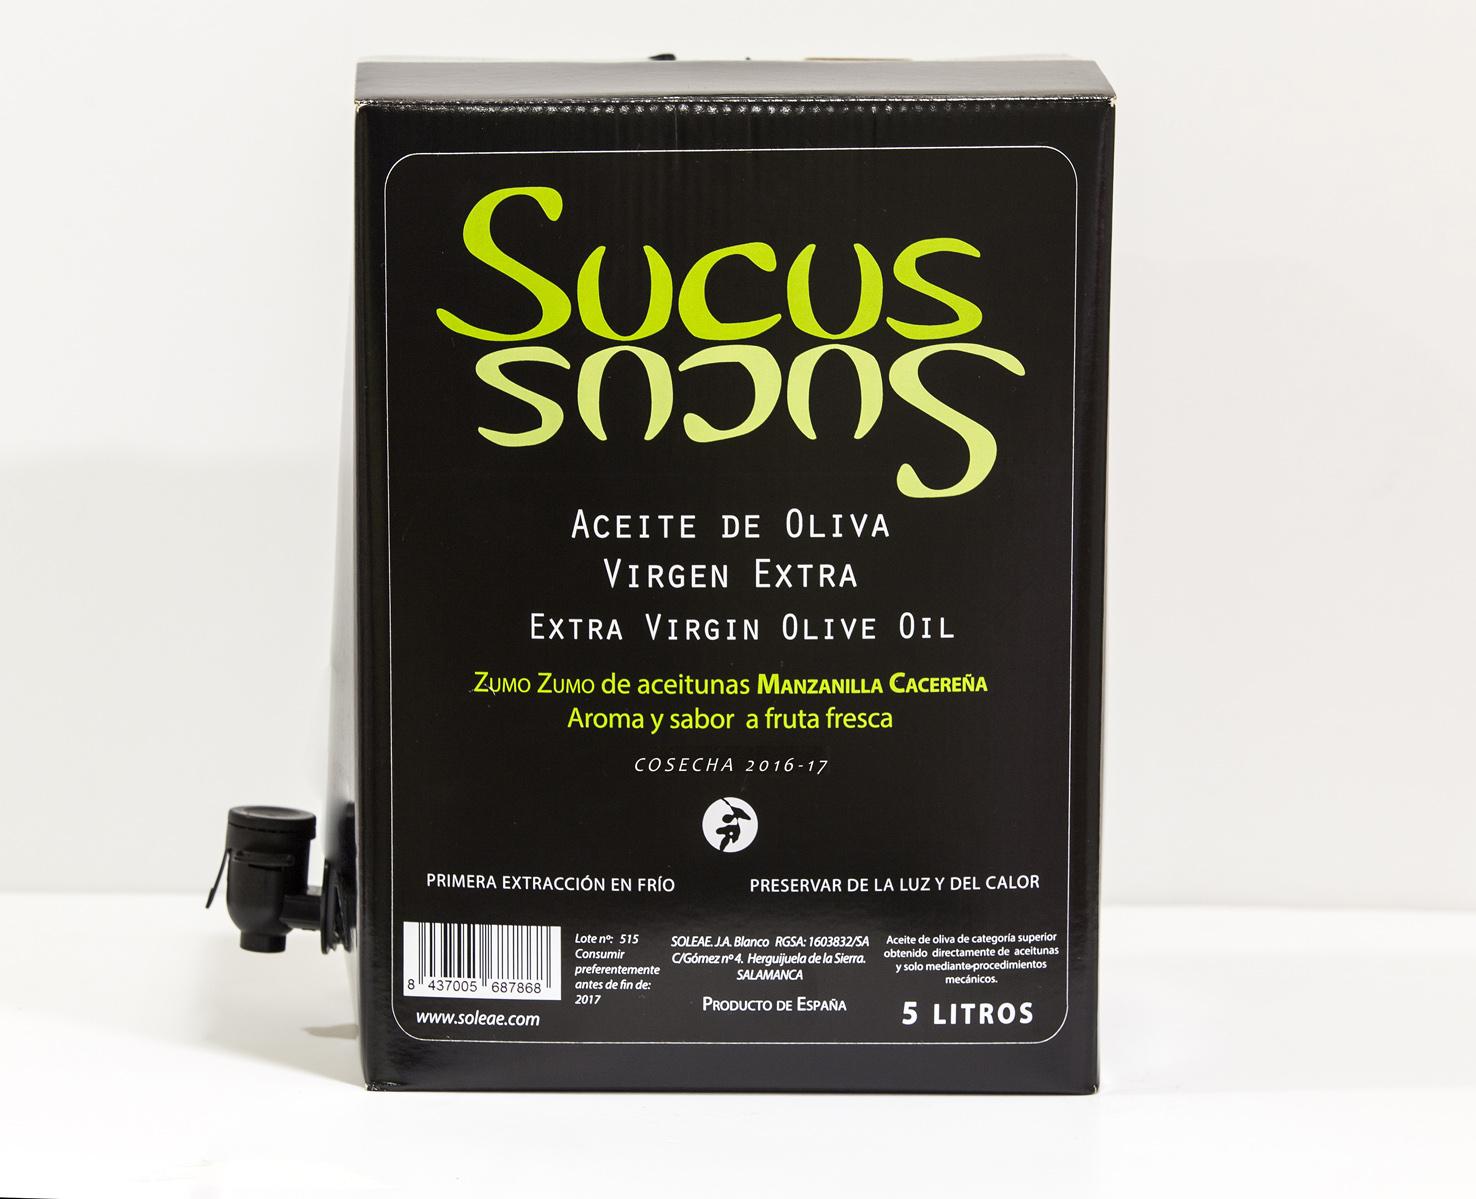 B_6 SUCUS 5 LITR small